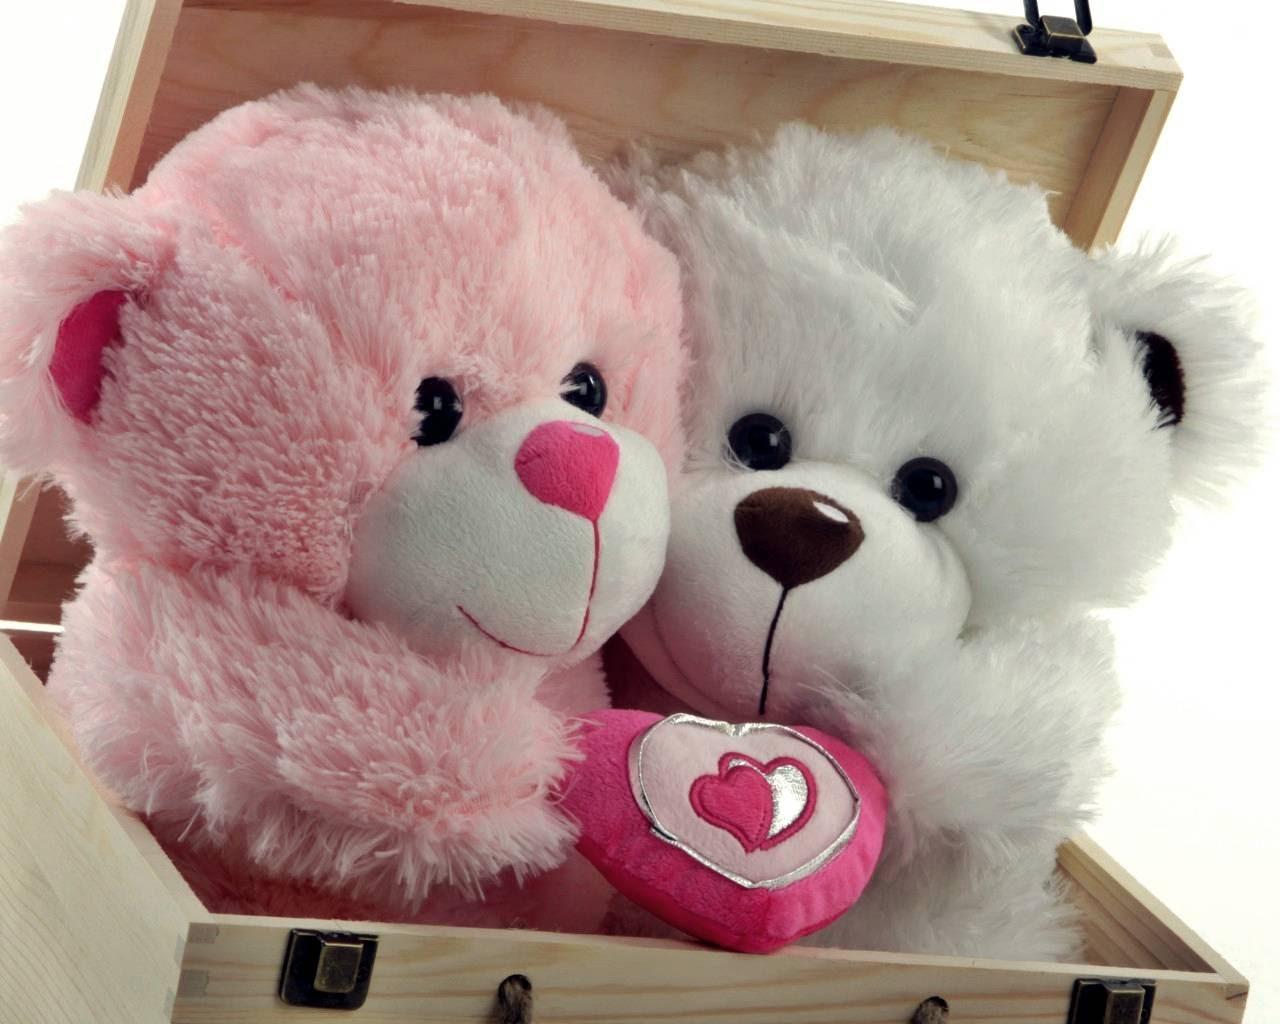 Download Wallpaper Toy Teddy Bear Teddy Iphone Hd 1280x1024